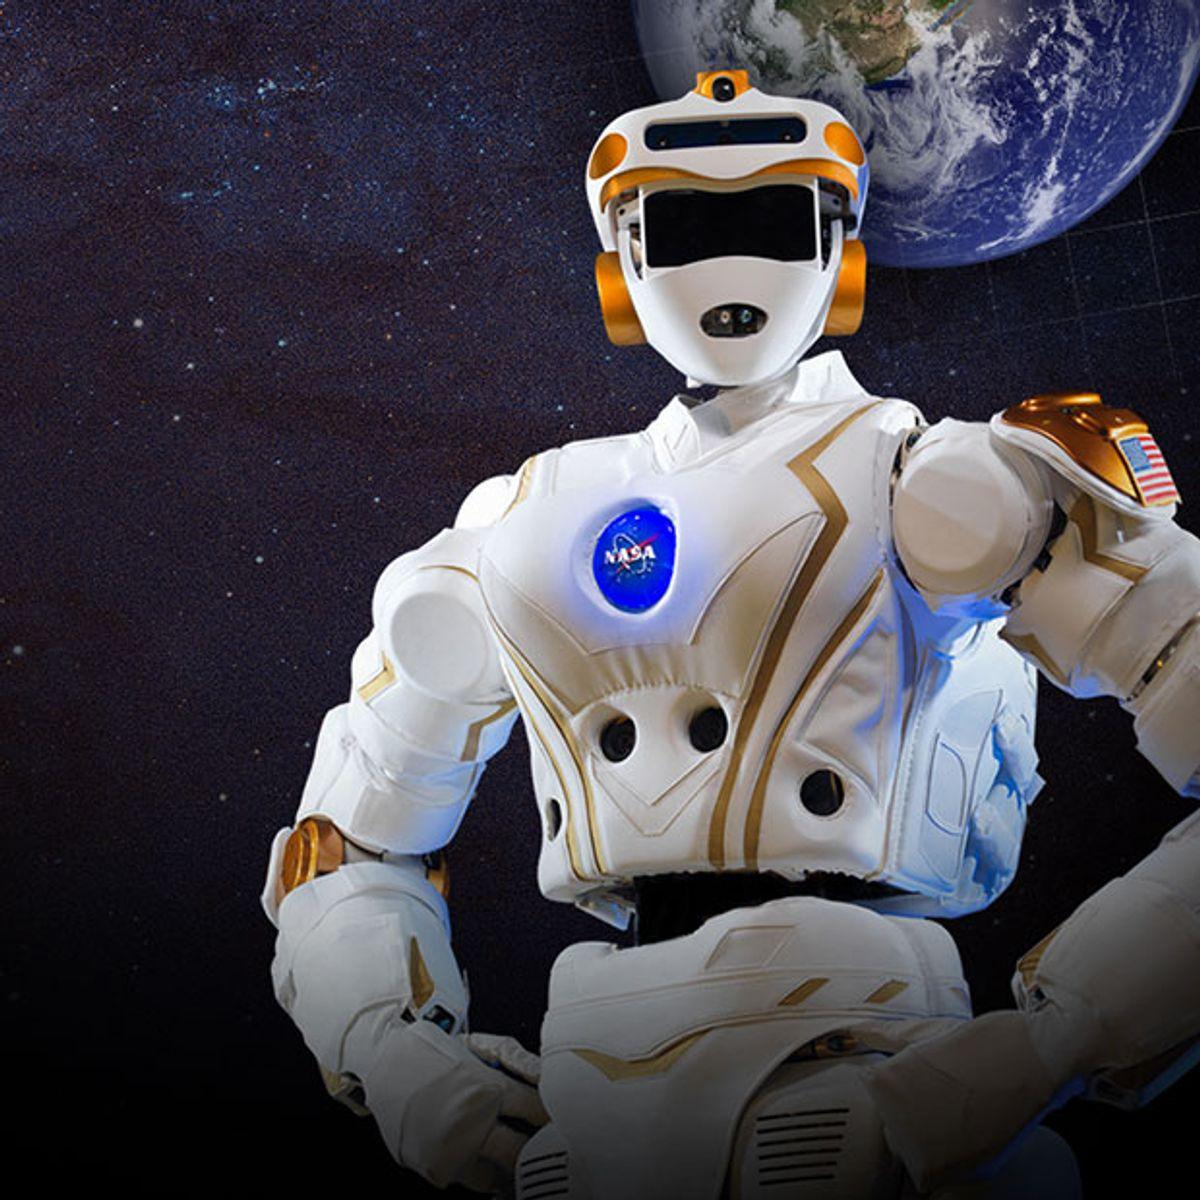 NASA Space Robotics Challenge R5 Valkyrie humanoid robot